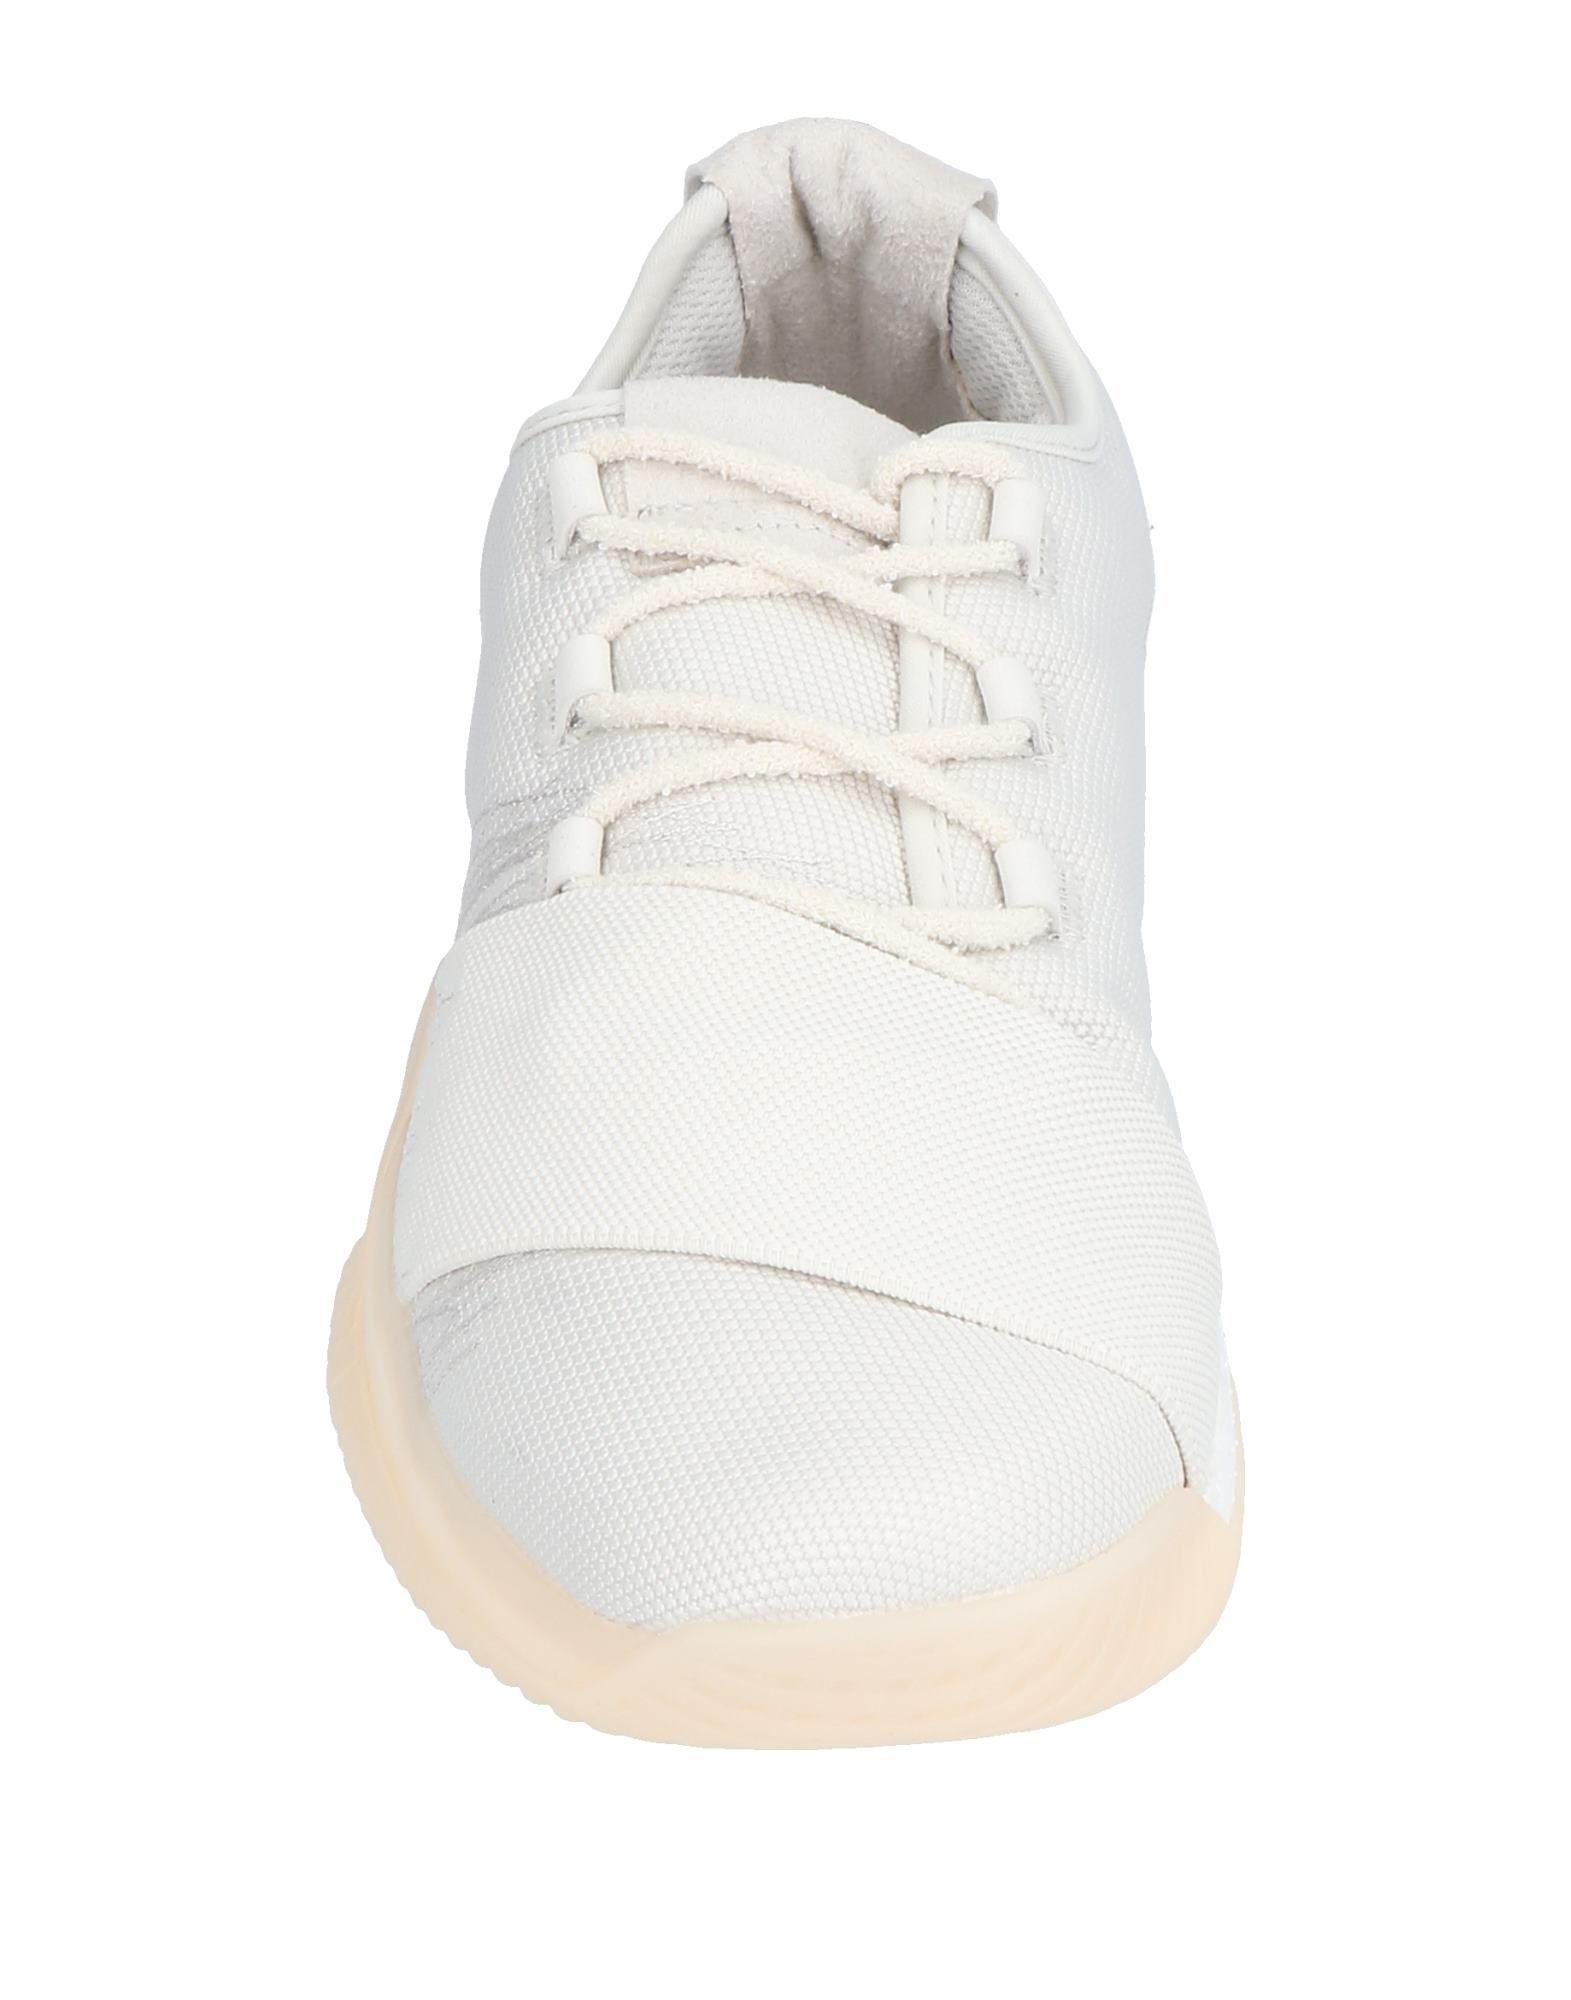 Moda Moda Moda Sneakers Adidas Uomo - 11494084TH bb65f8